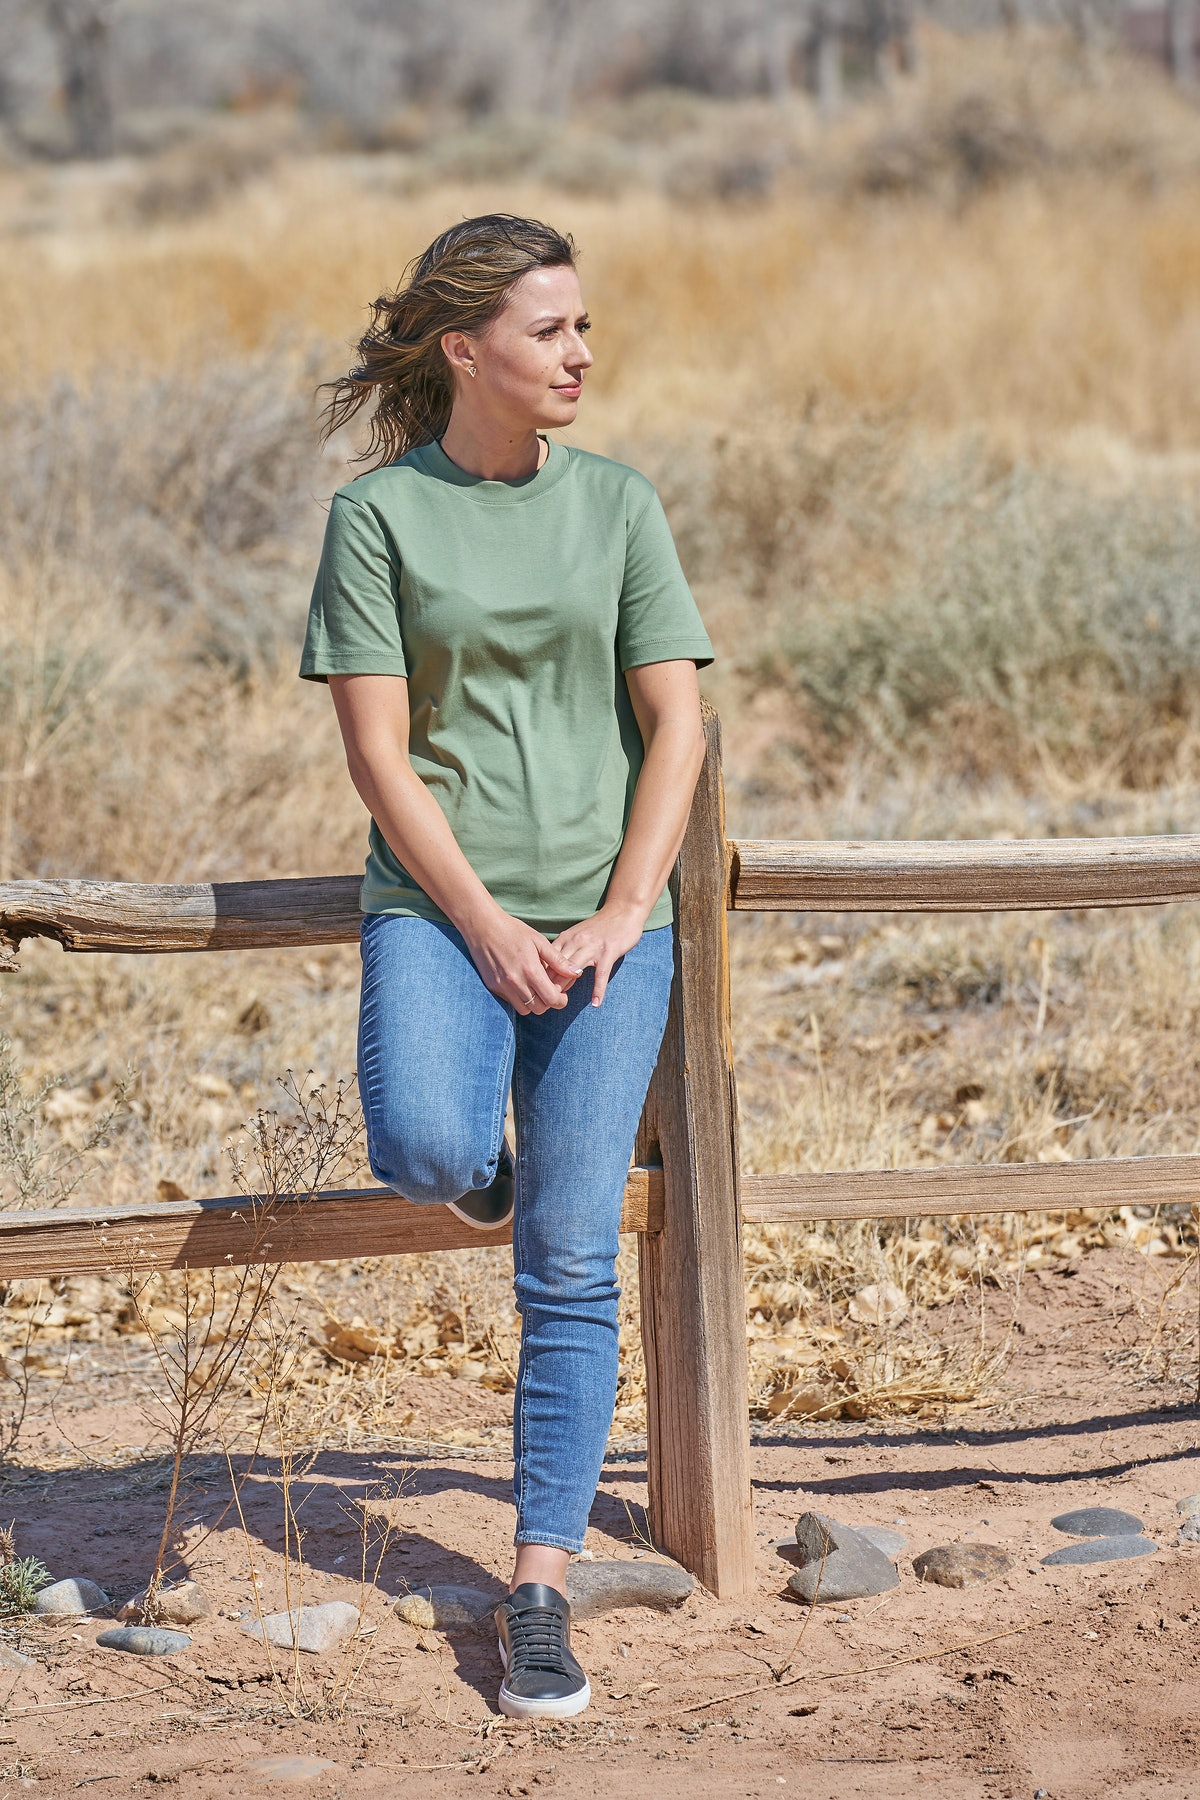 Katie Thurston on Season 17 of 'The Bachelorette'